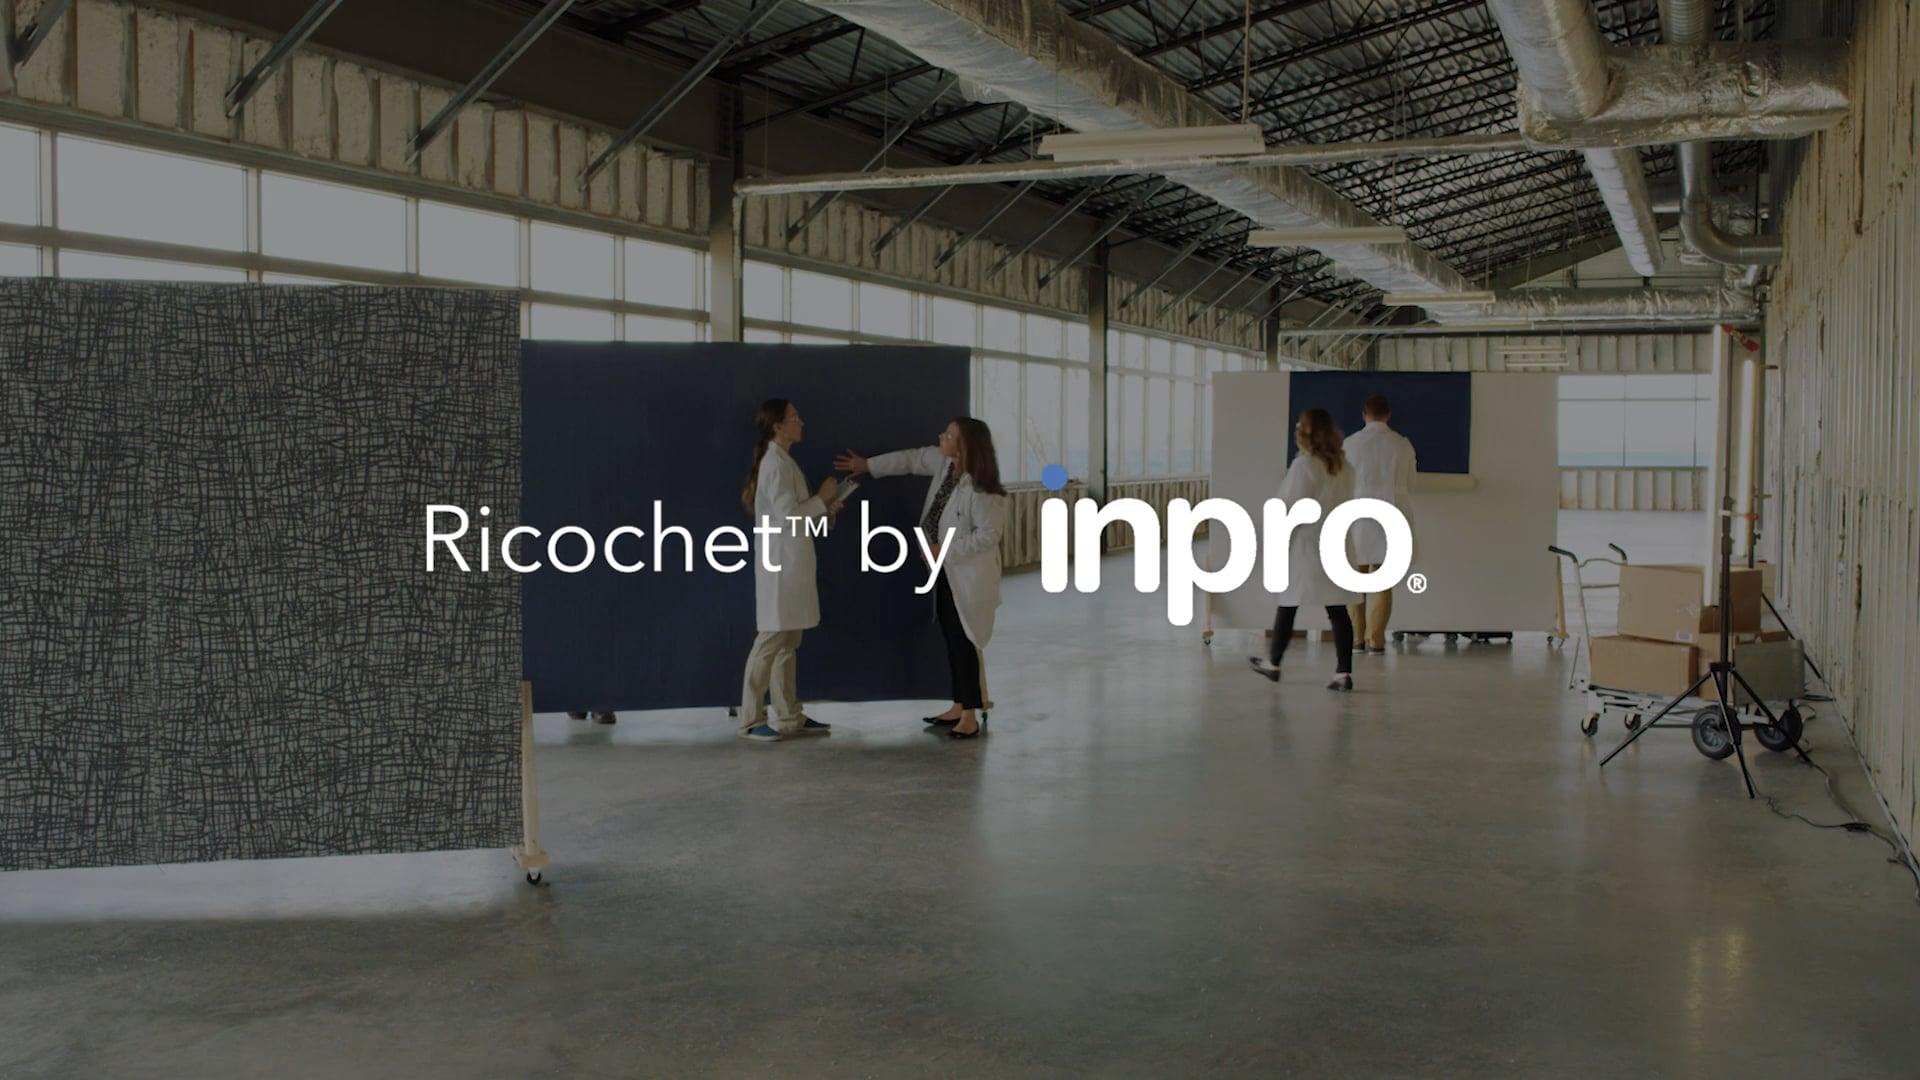 Inpro Ricochet